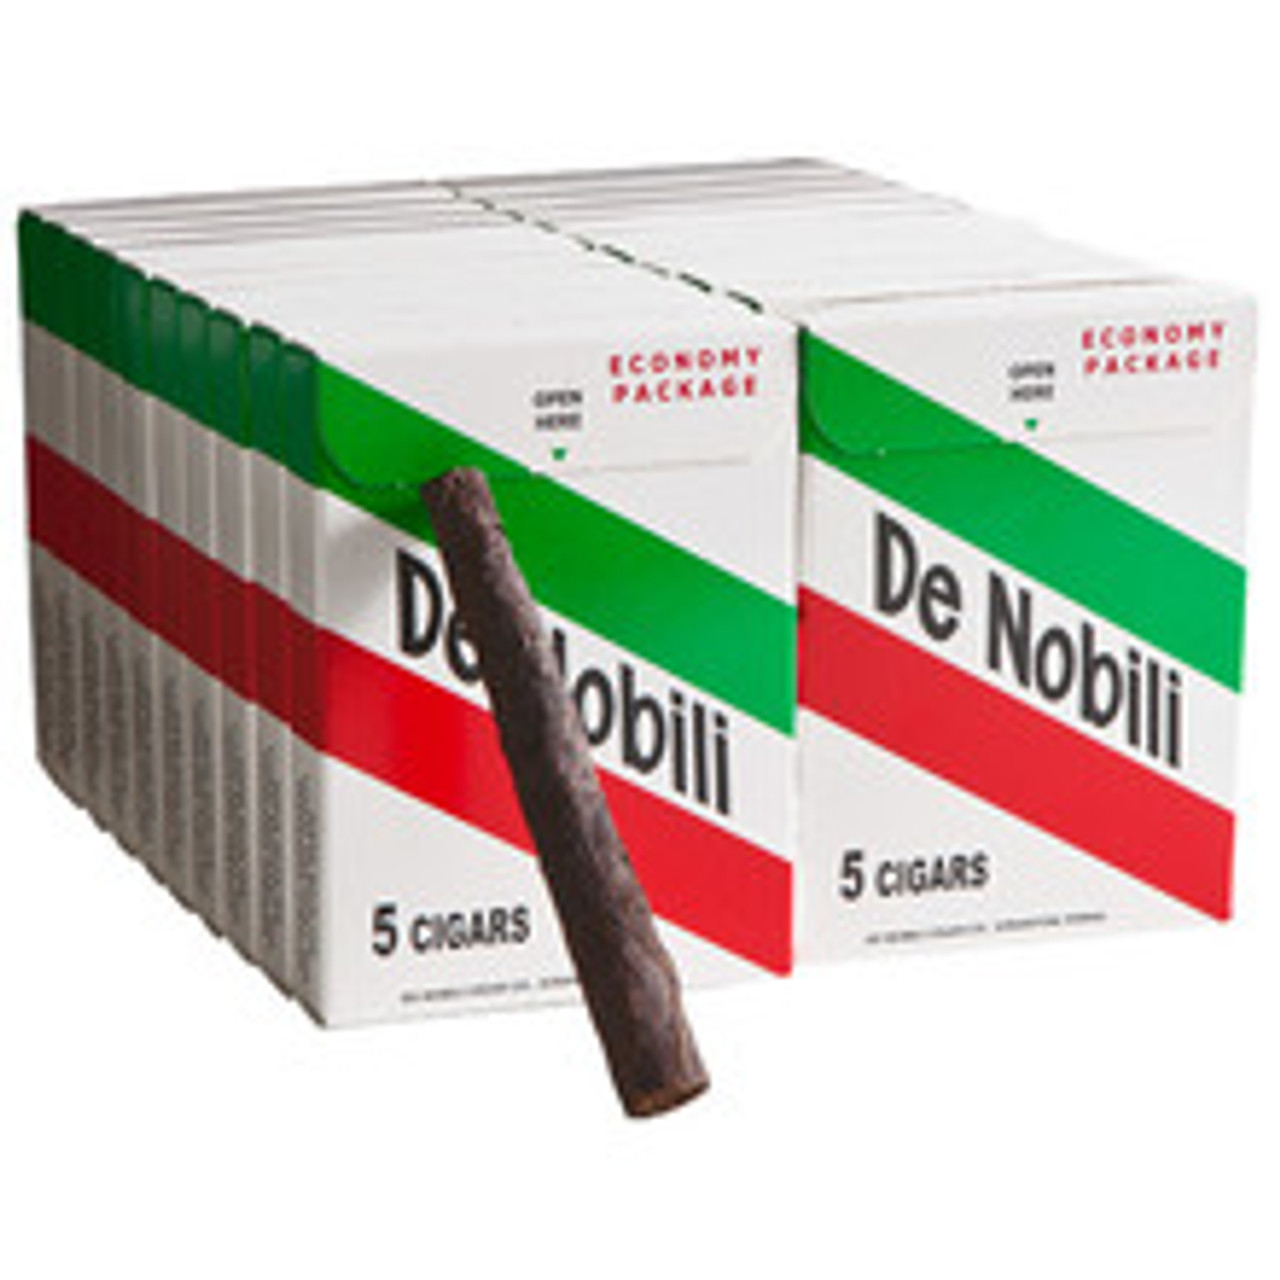 De Nobili Economy Cigars (20 Packs Of 5) - Natural